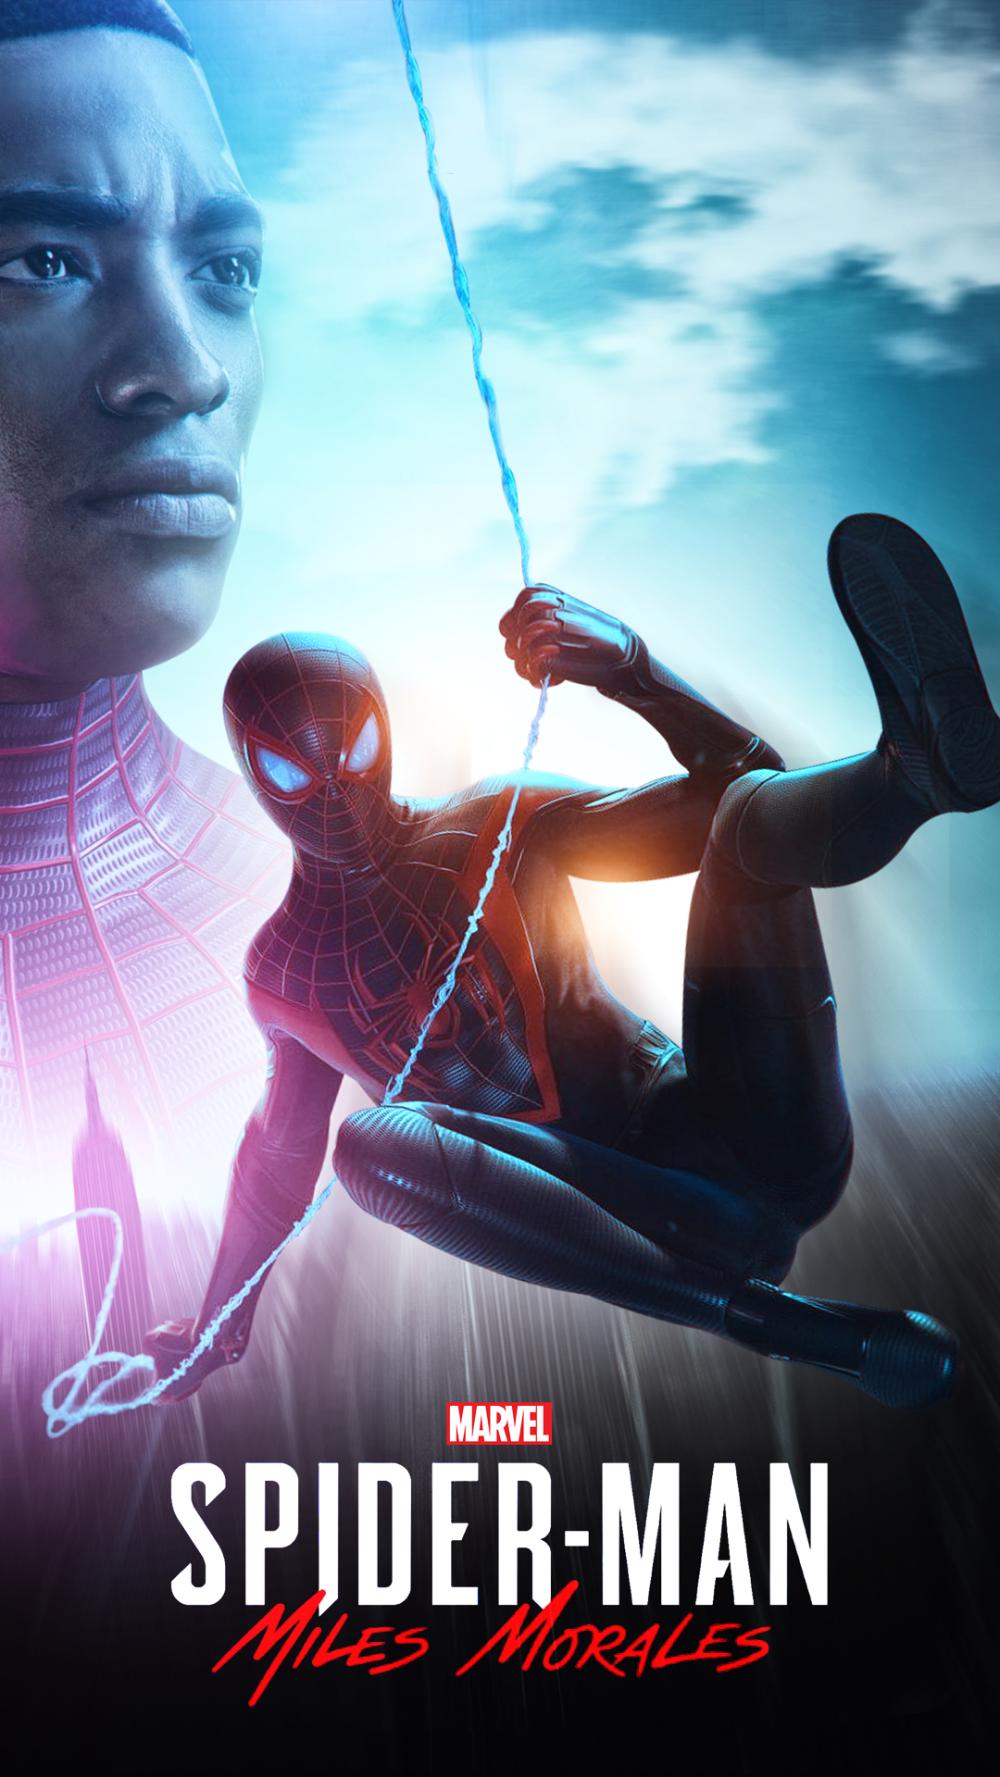 2020 Marvels Spider Man Miles Morales Game In 2160x3840 Resolution Miles Morales Spiderman Miles Morales Marvel Spiderman